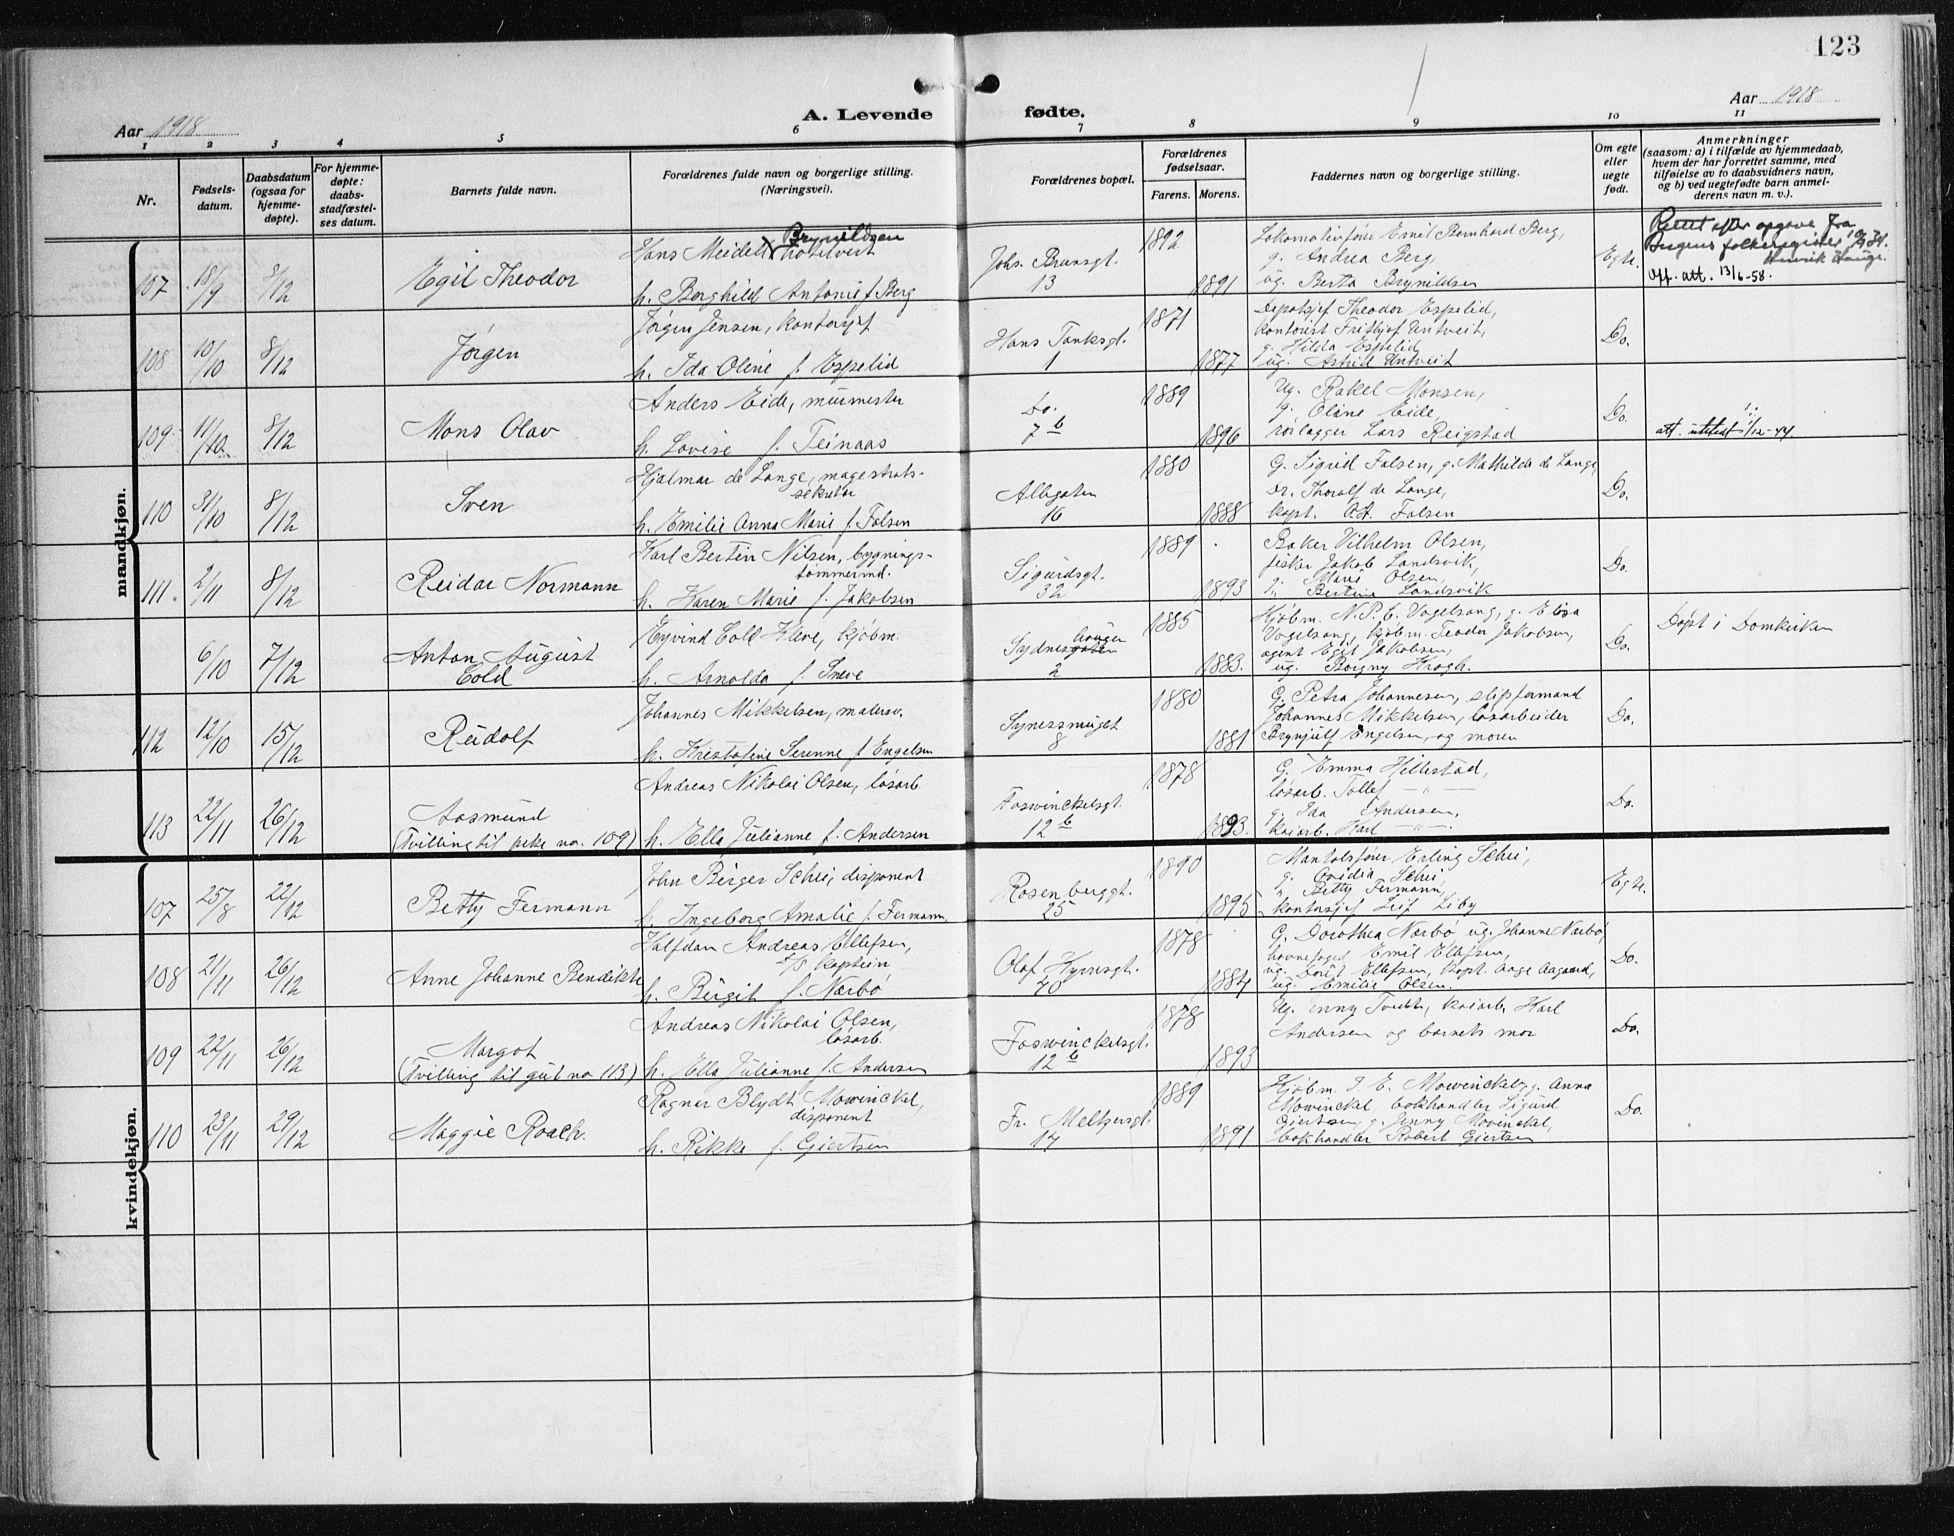 SAB, Johanneskirken Sokneprestembete, H/Haa: Ministerialbok nr. A 3, 1913-1934, s. 123